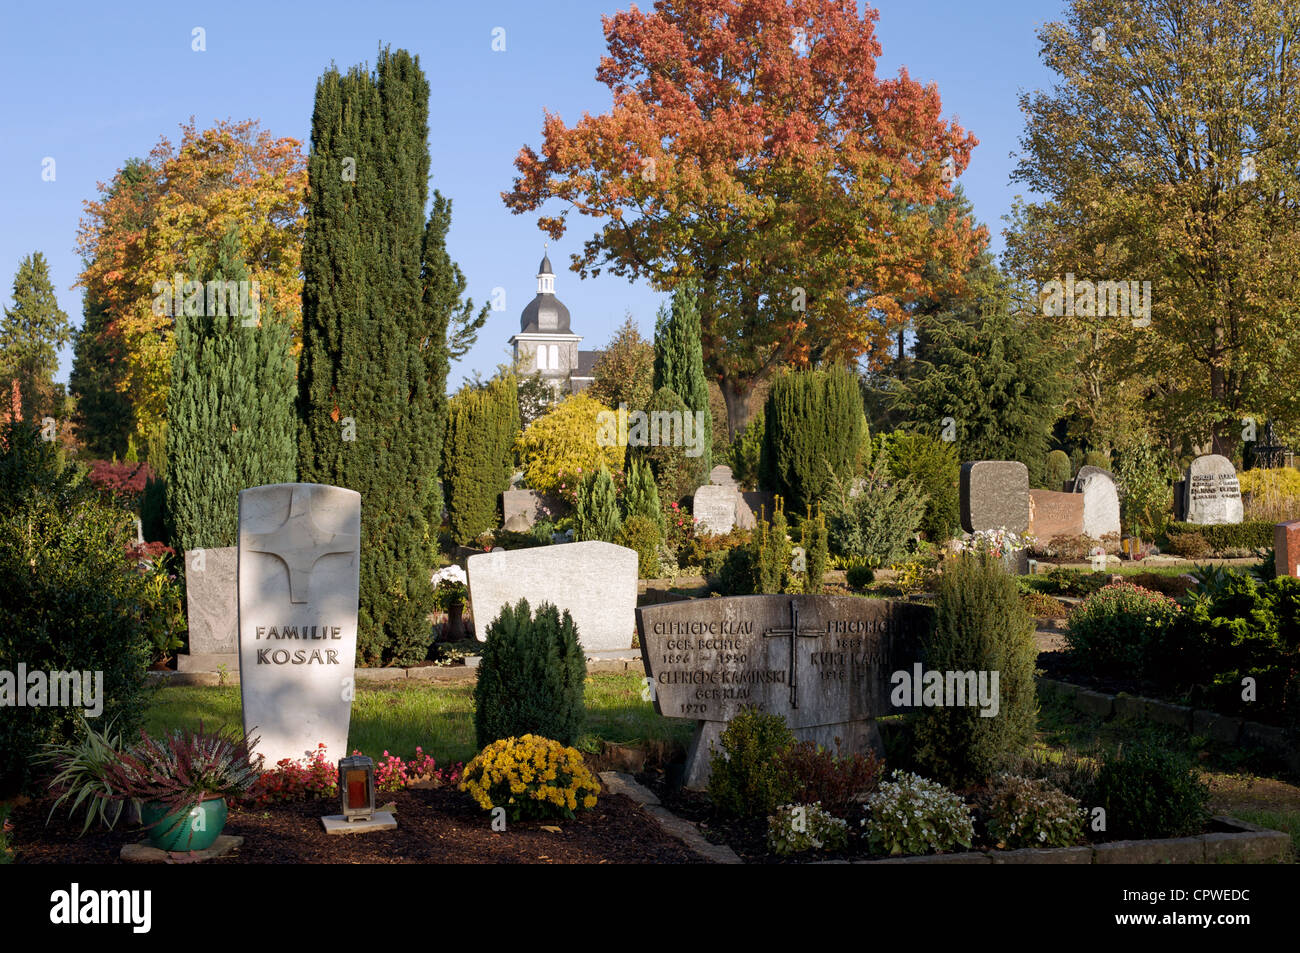 German church and graveyard - Stock Image